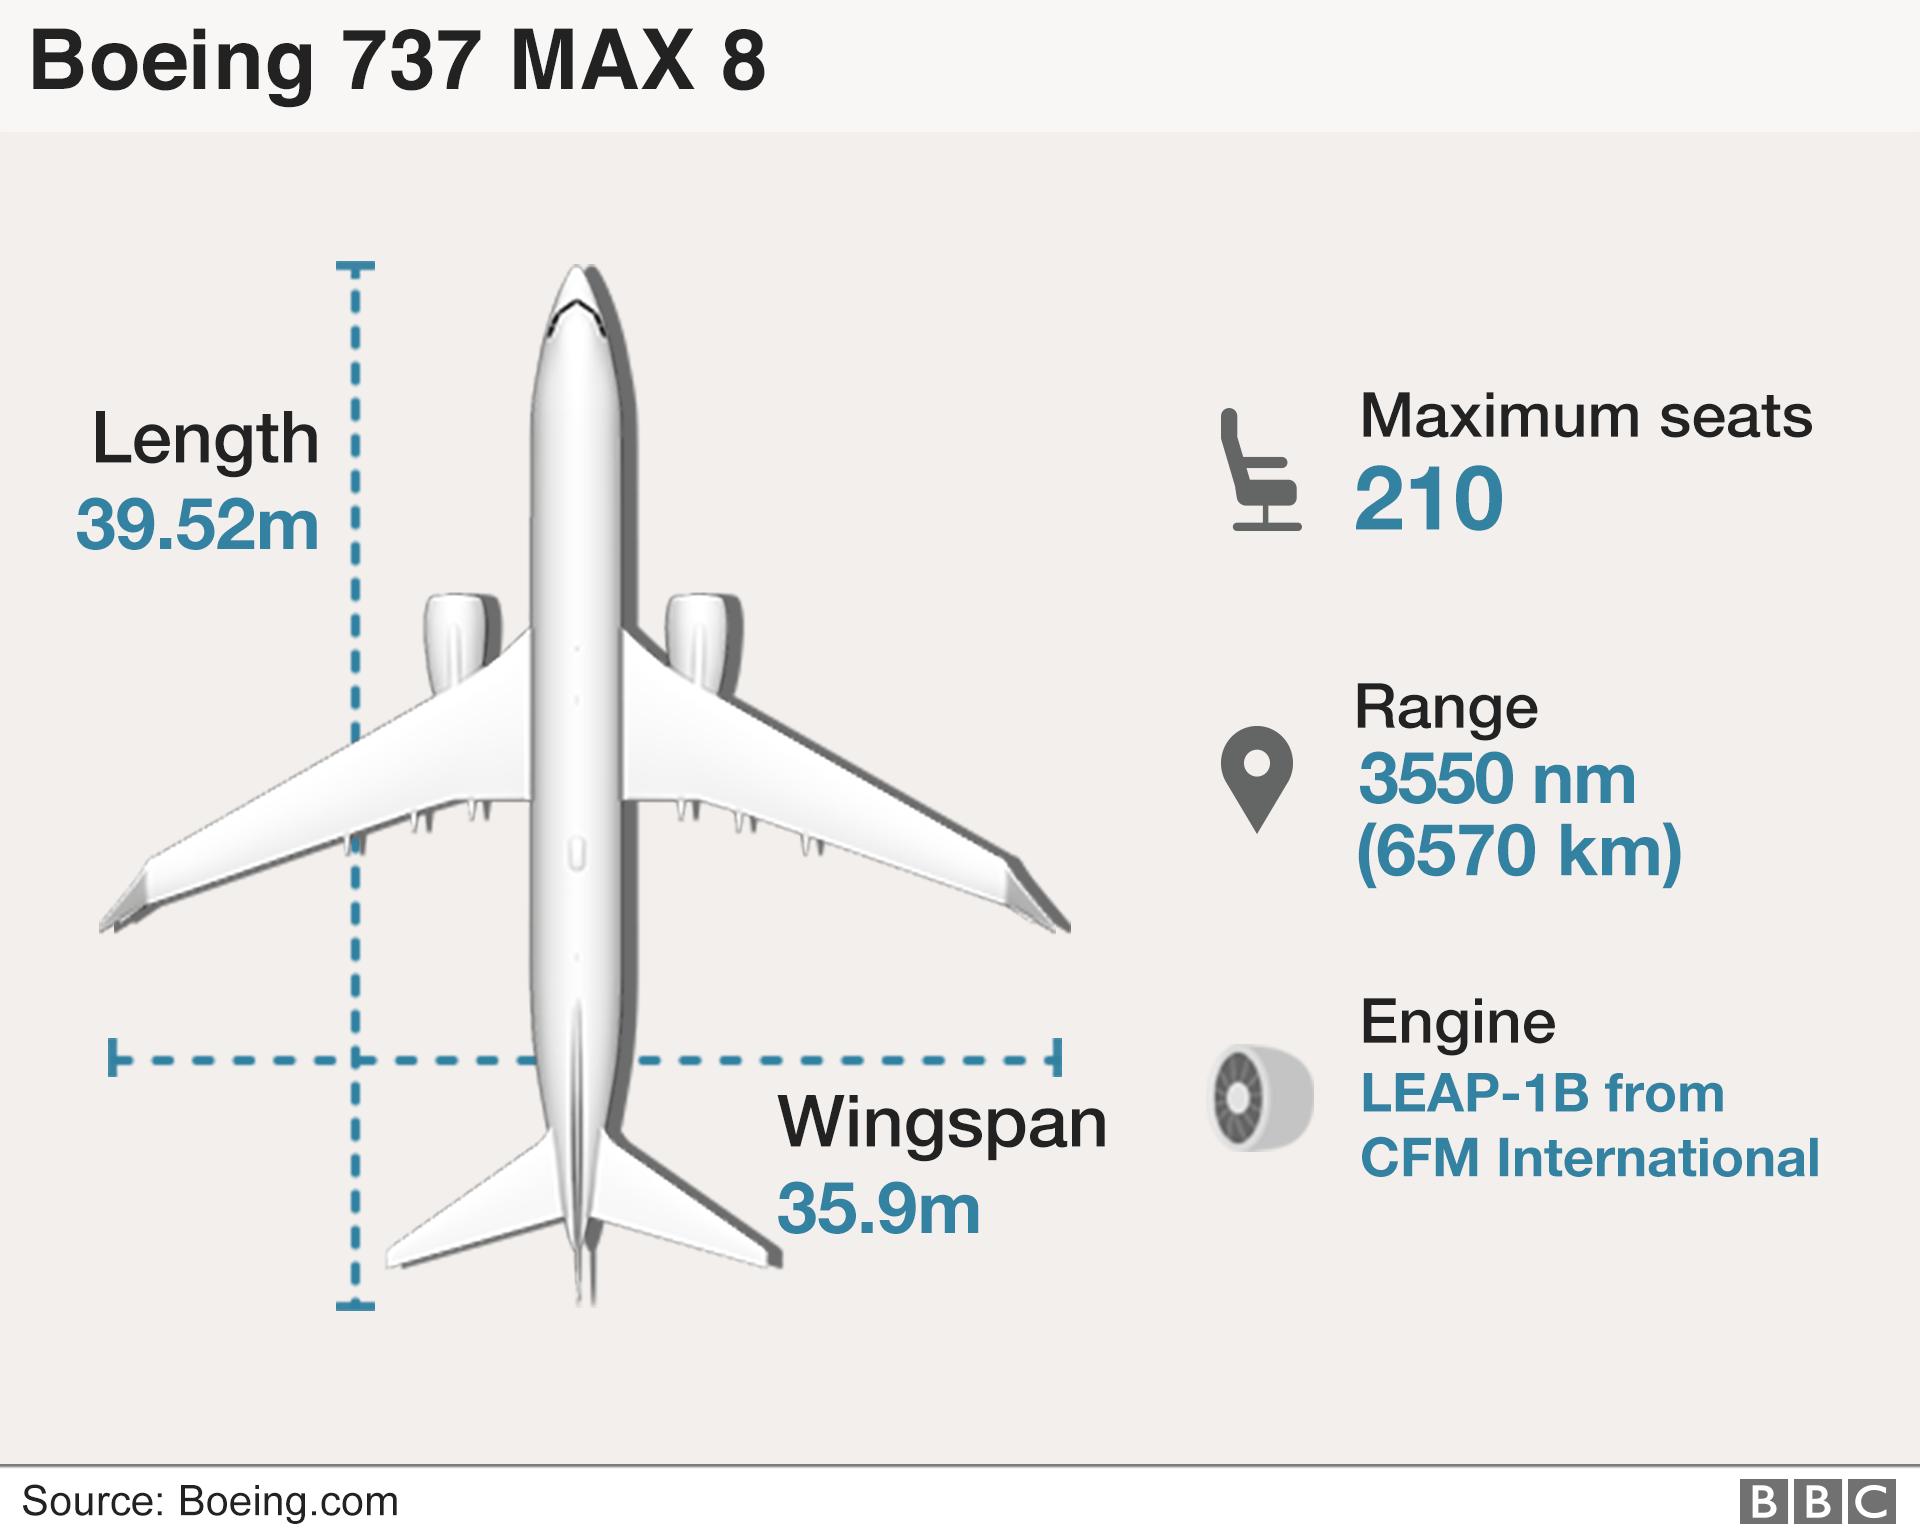 US FAA says Boeing 737 Max 8 is airworthy